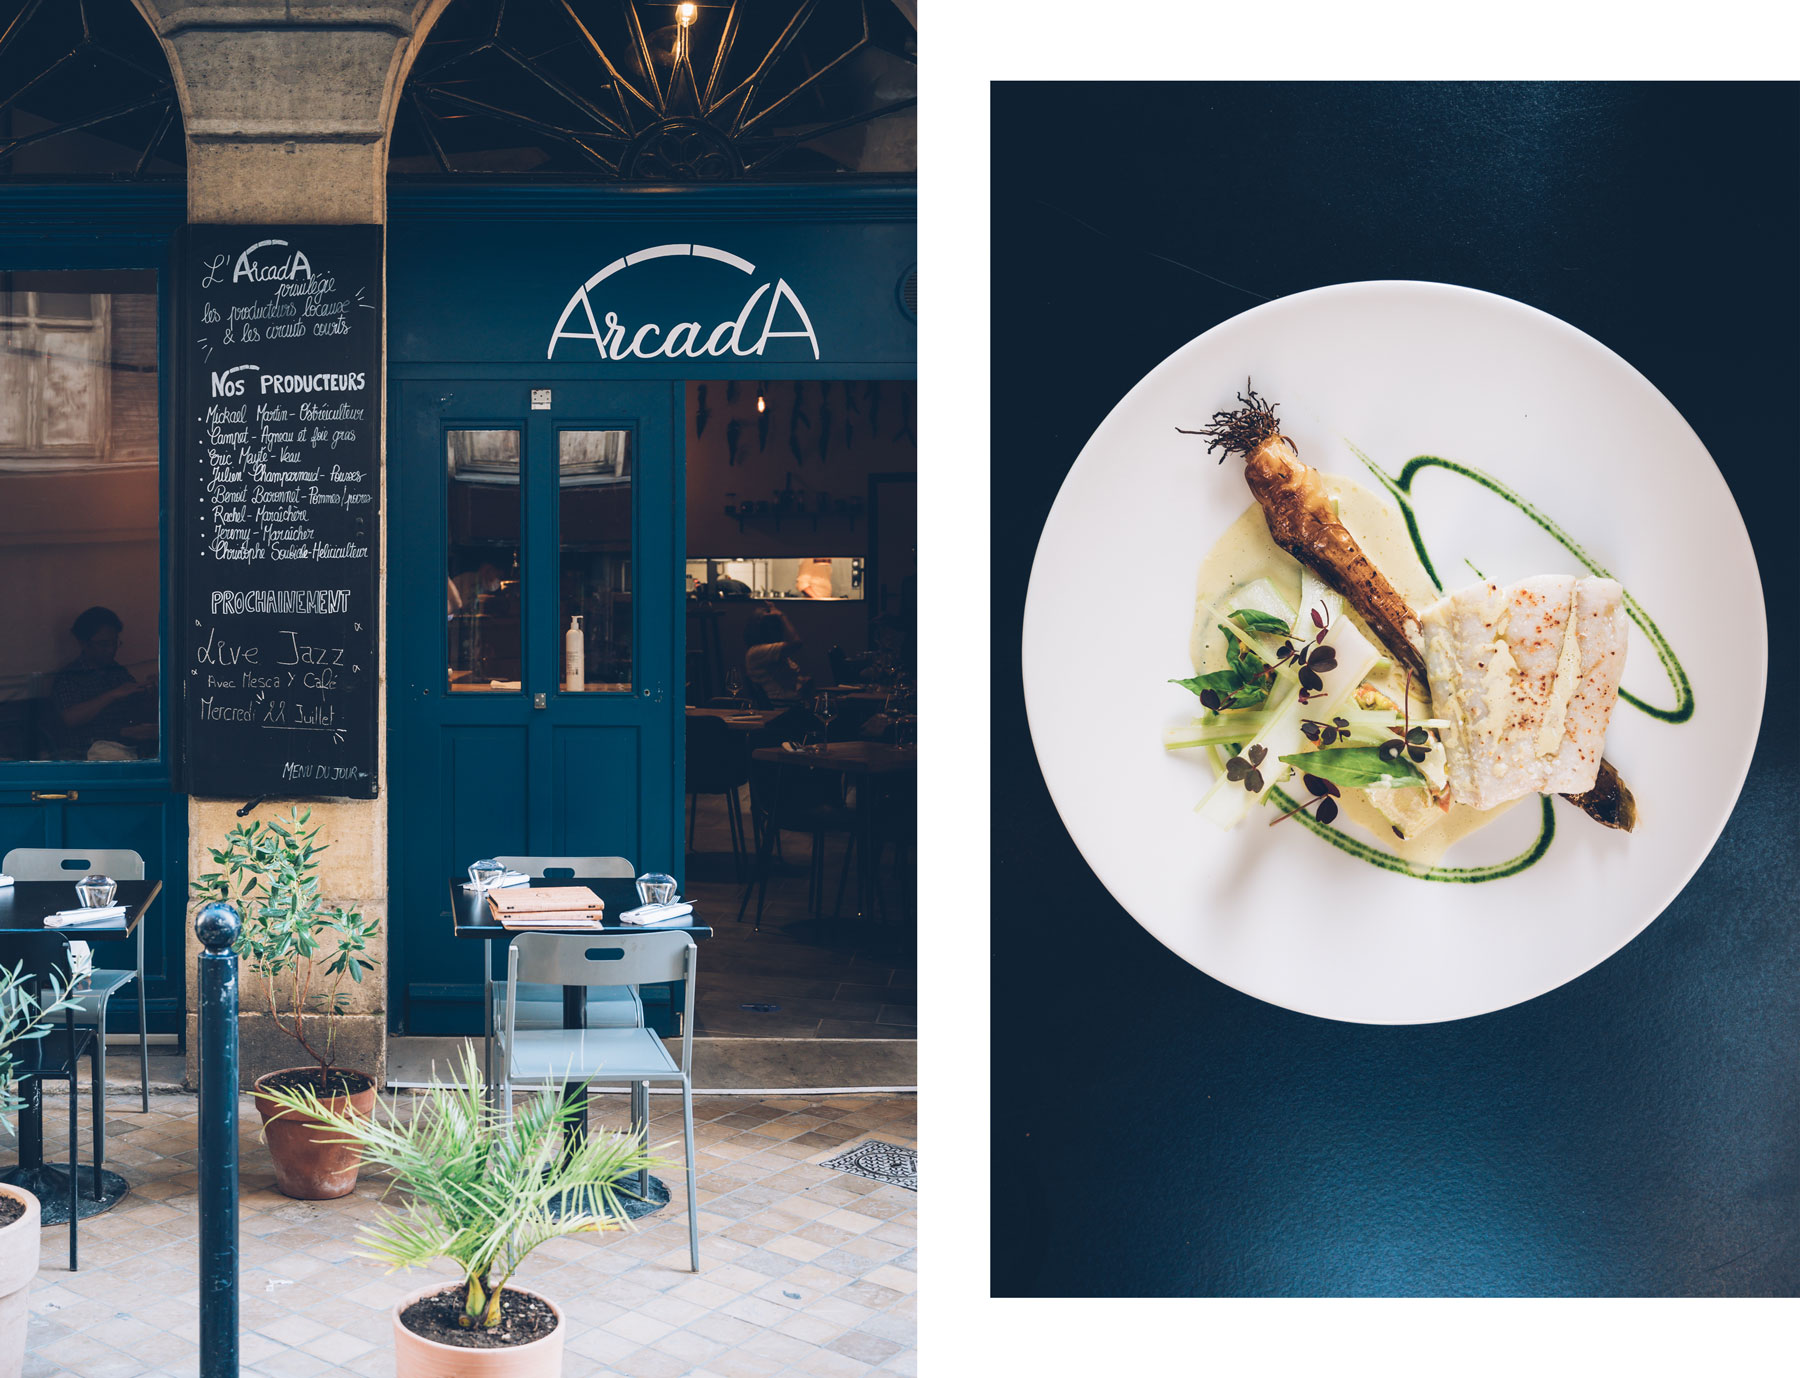 Arcada, Resto Bordeaux